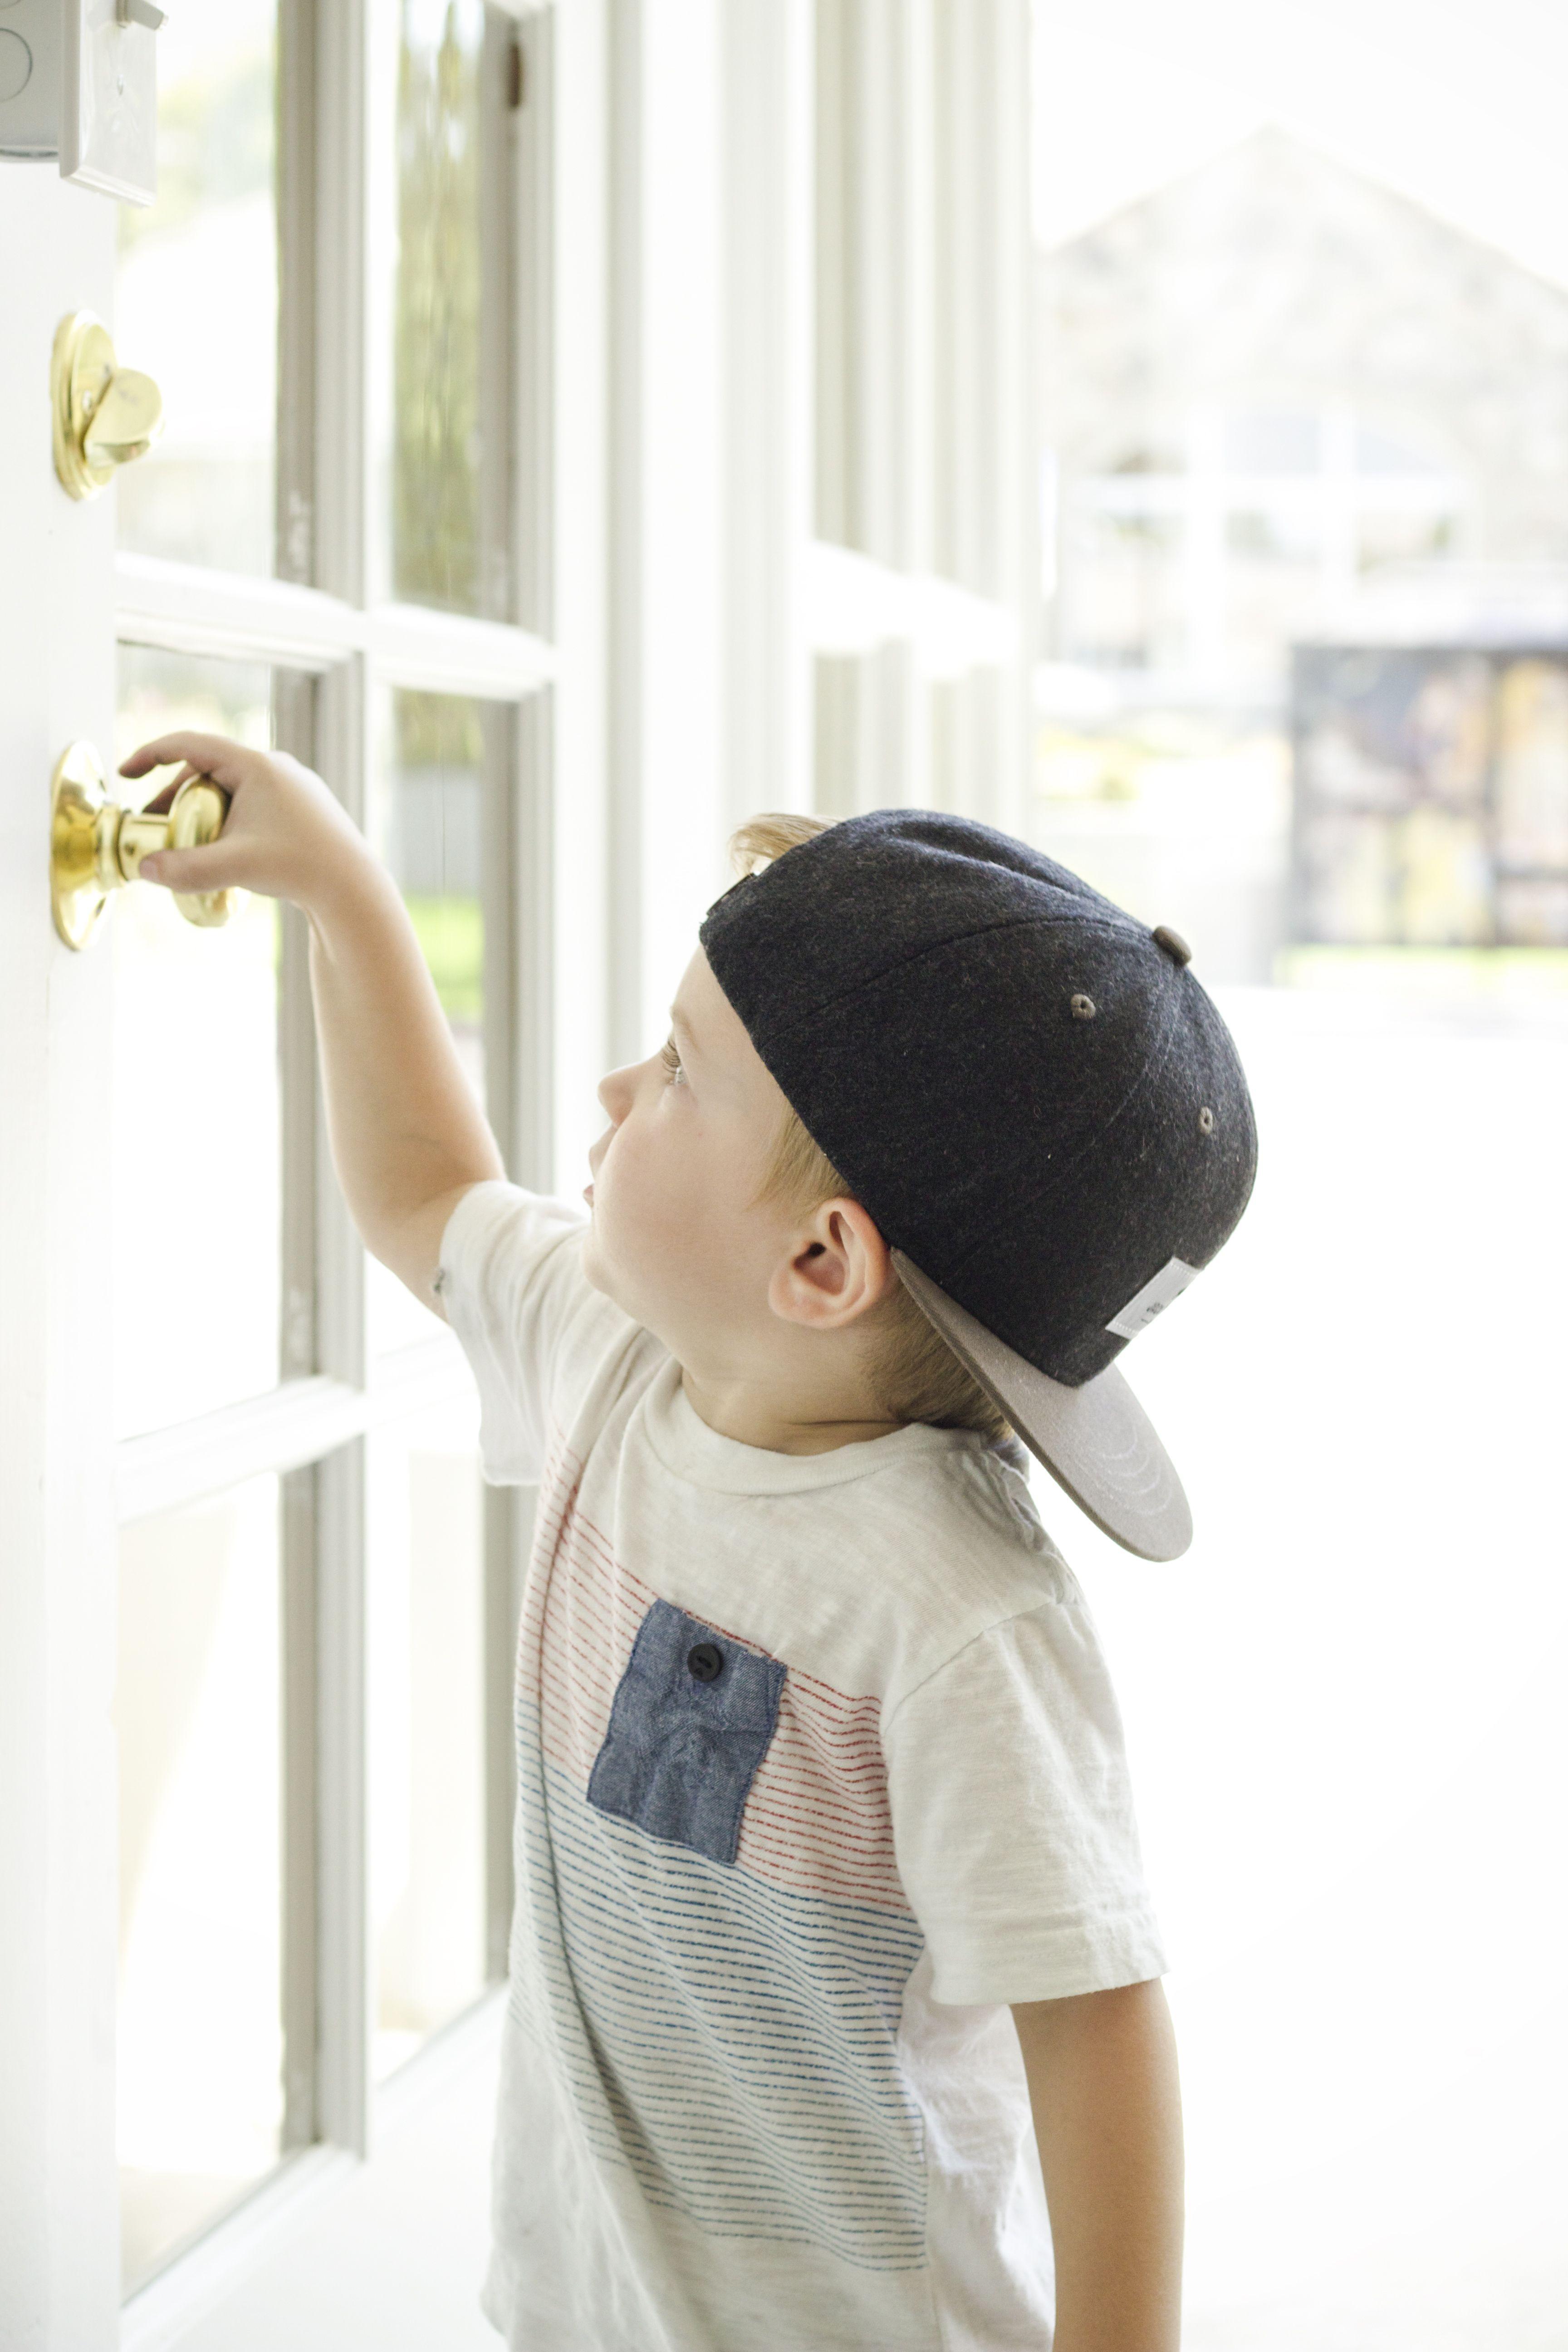 the best attitude 6cf68 ad2e6 Baby Blue 5-Panel Polyester Snapback Hat Jack and Winn by JackandWinnHatCo  on Etsy   yesssss   Hats, Baby hats, Snapback hats